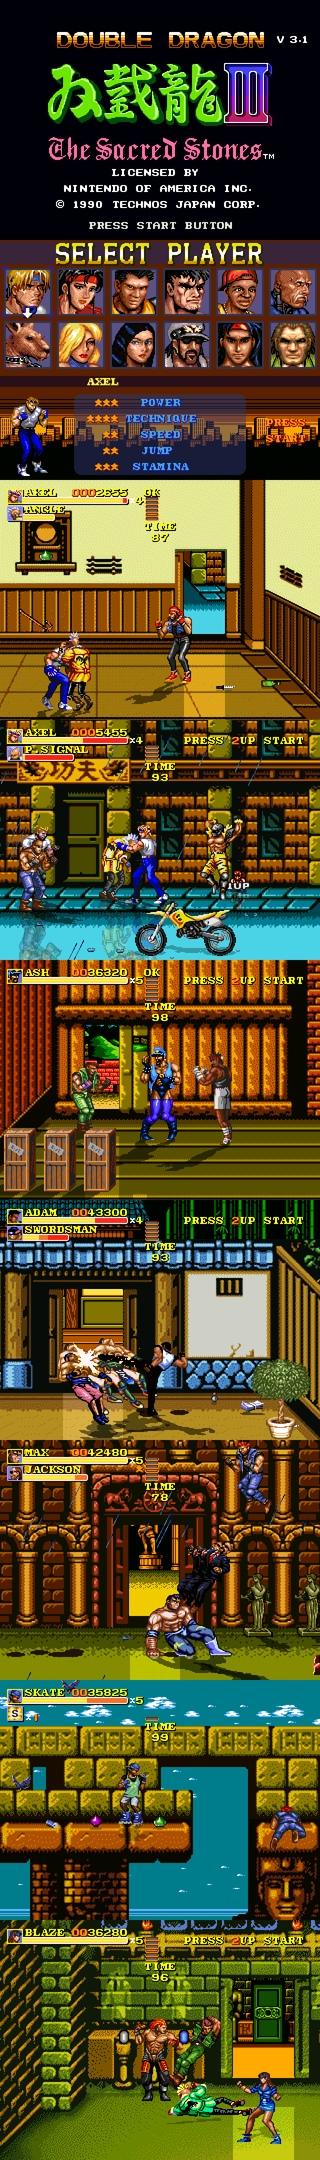 Double Dragon III (NES) v3.1 by Serrr. Kyqvcn10